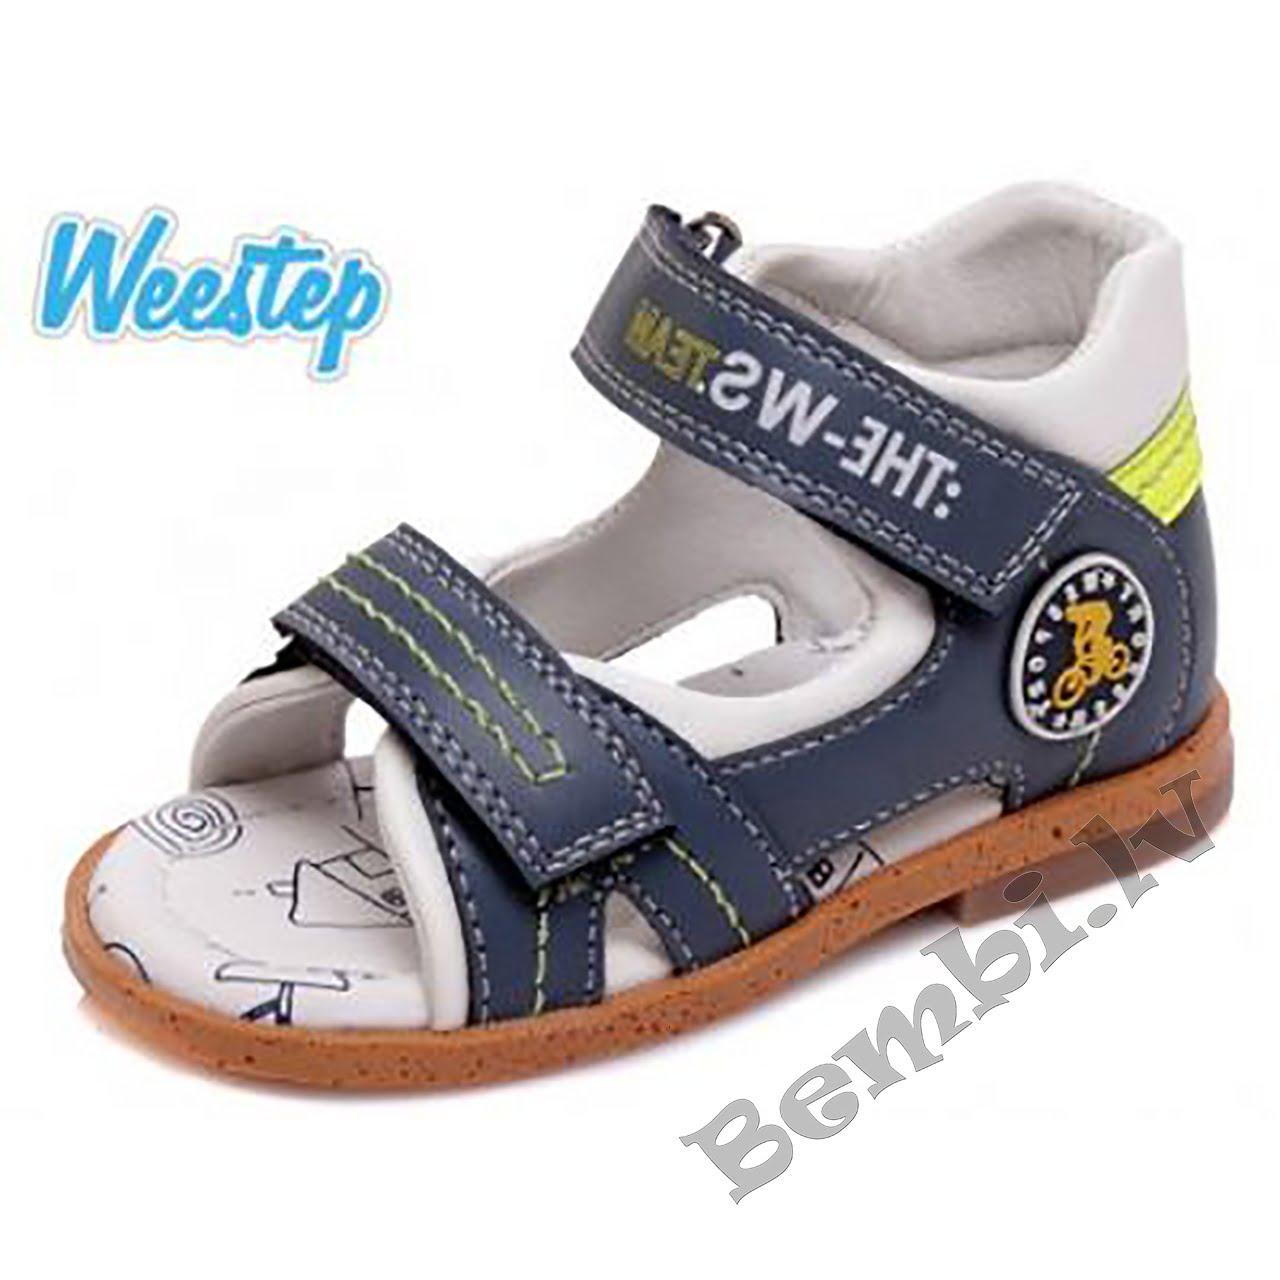 Zēnu sandales